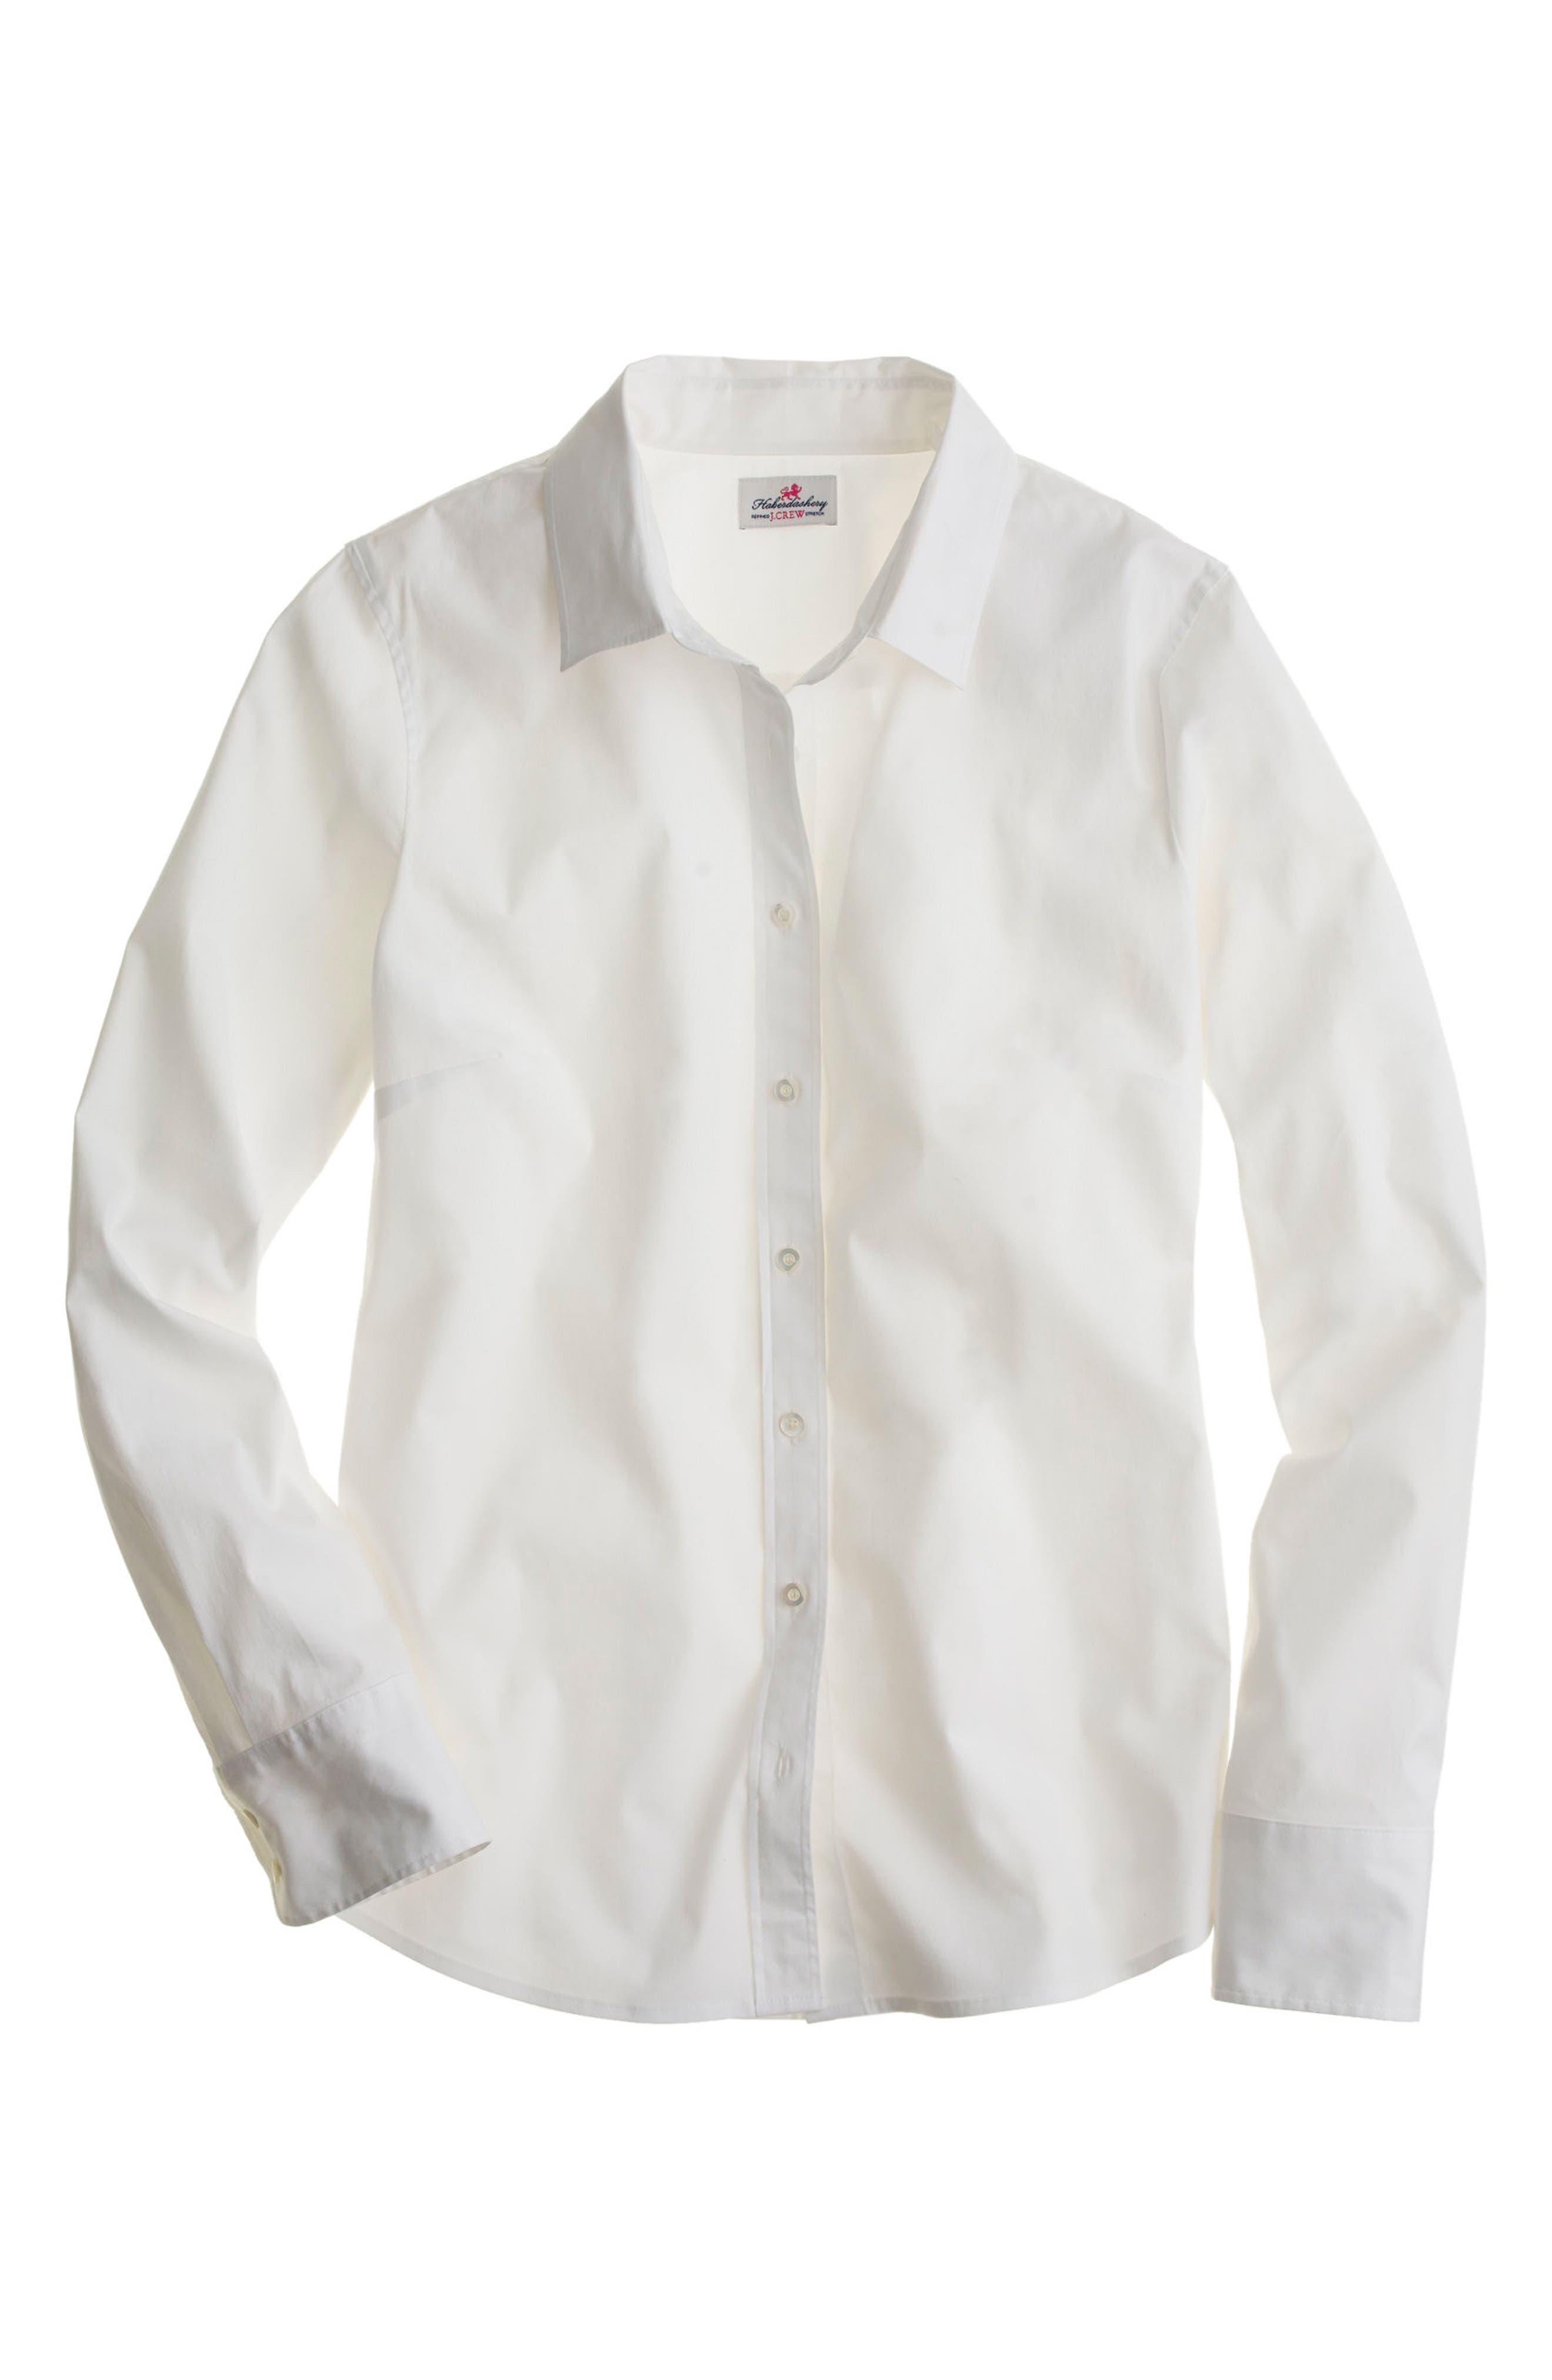 Main Image - J.Crew Stretch Perfect Shirt (Regular & Petite)